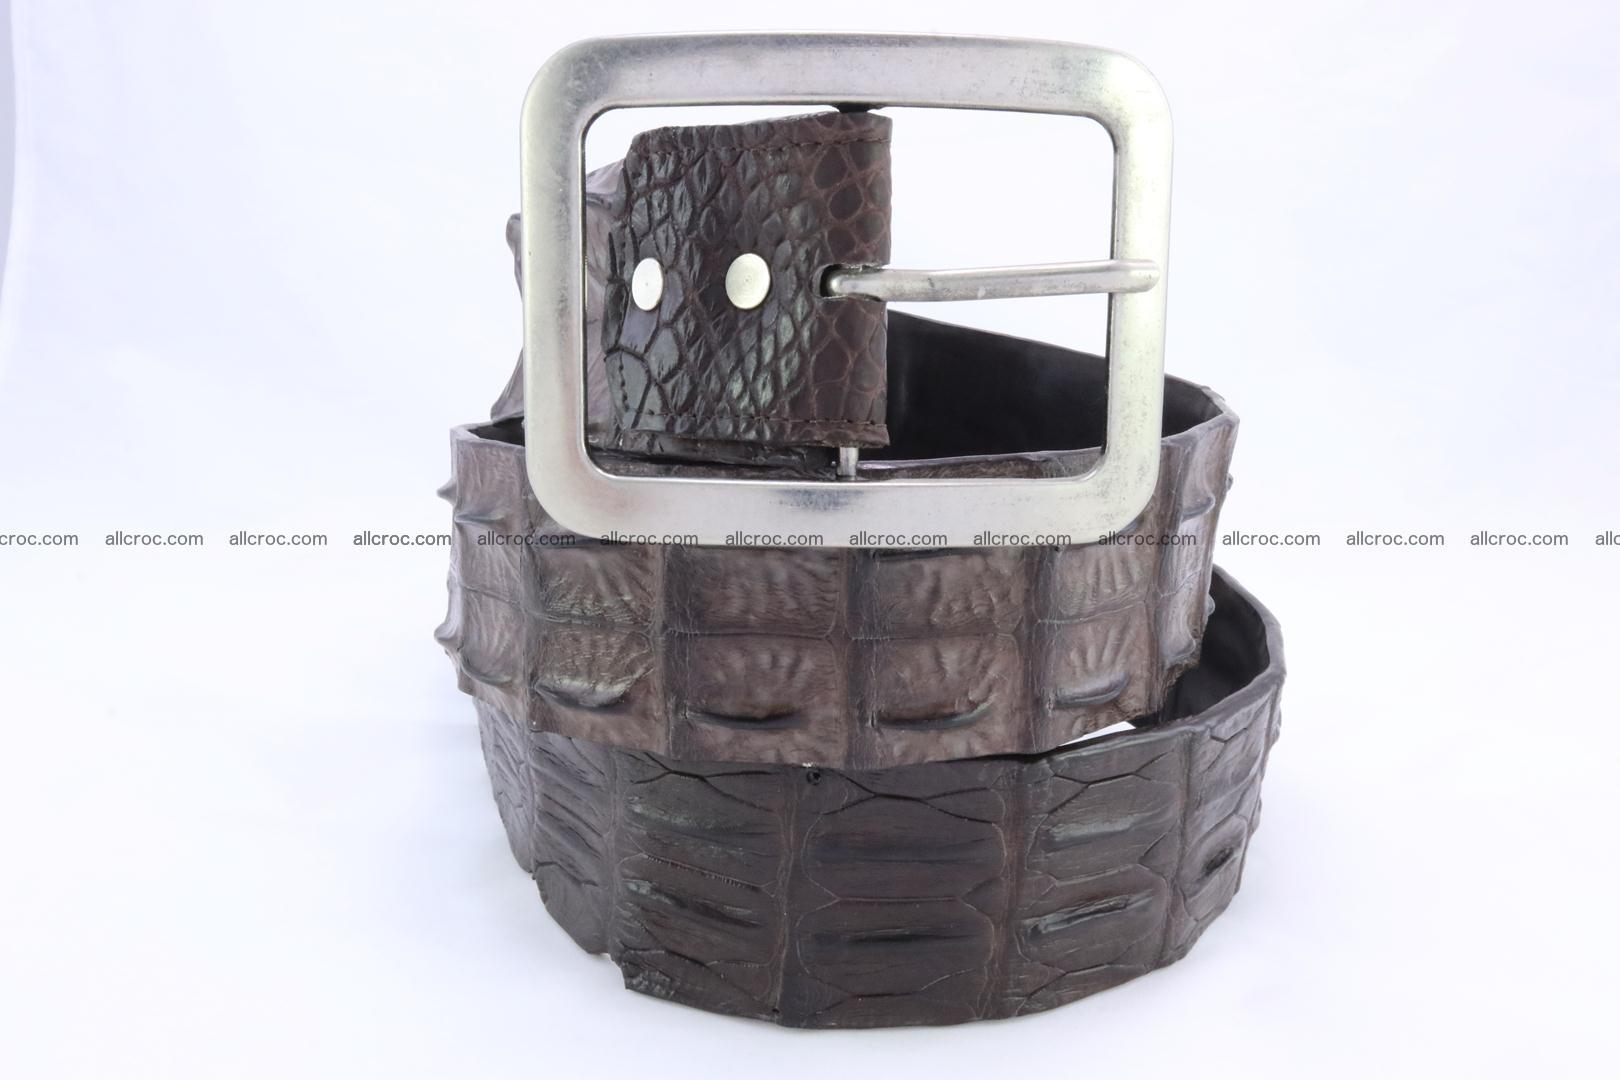 Genuine crocodile hornback belt for jeans width 50mm 155 Foto 1